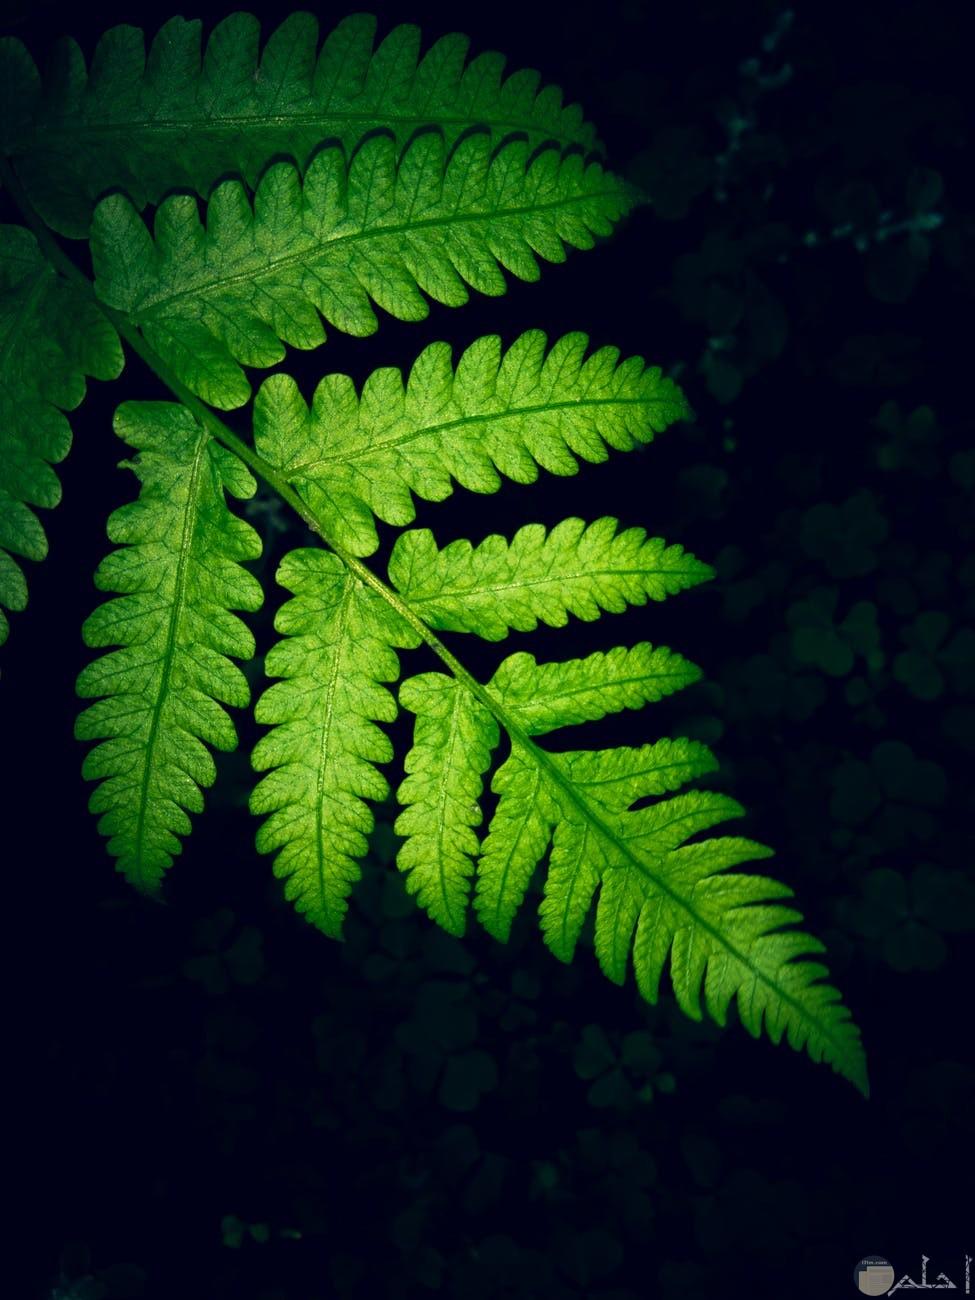 صور نباتات خضراء بالظلام